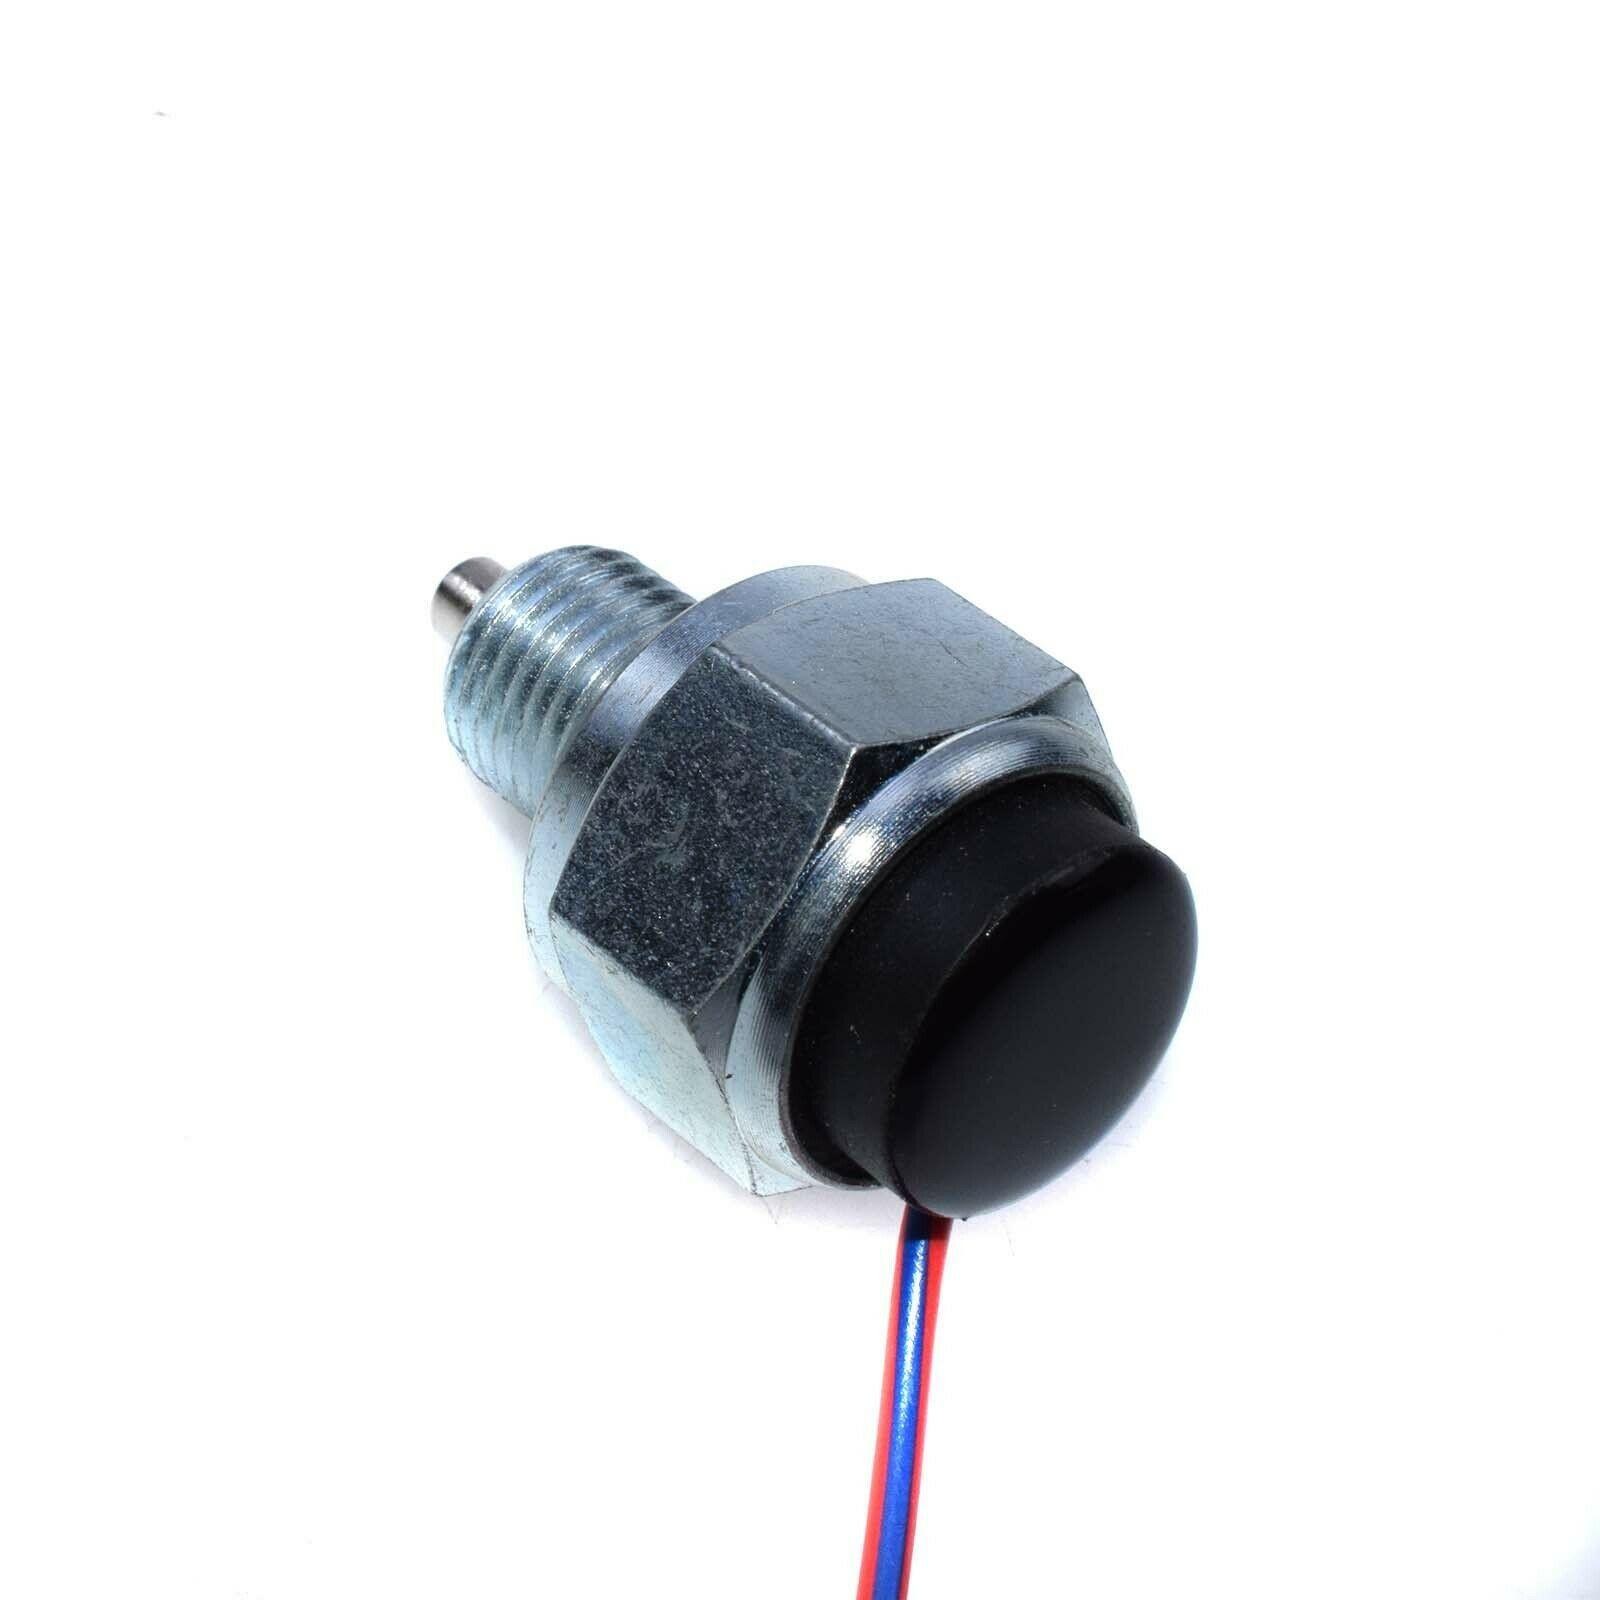 Sensor Interruptor 4x4 L200 Triton Dakar - MR580153 ou MR453316